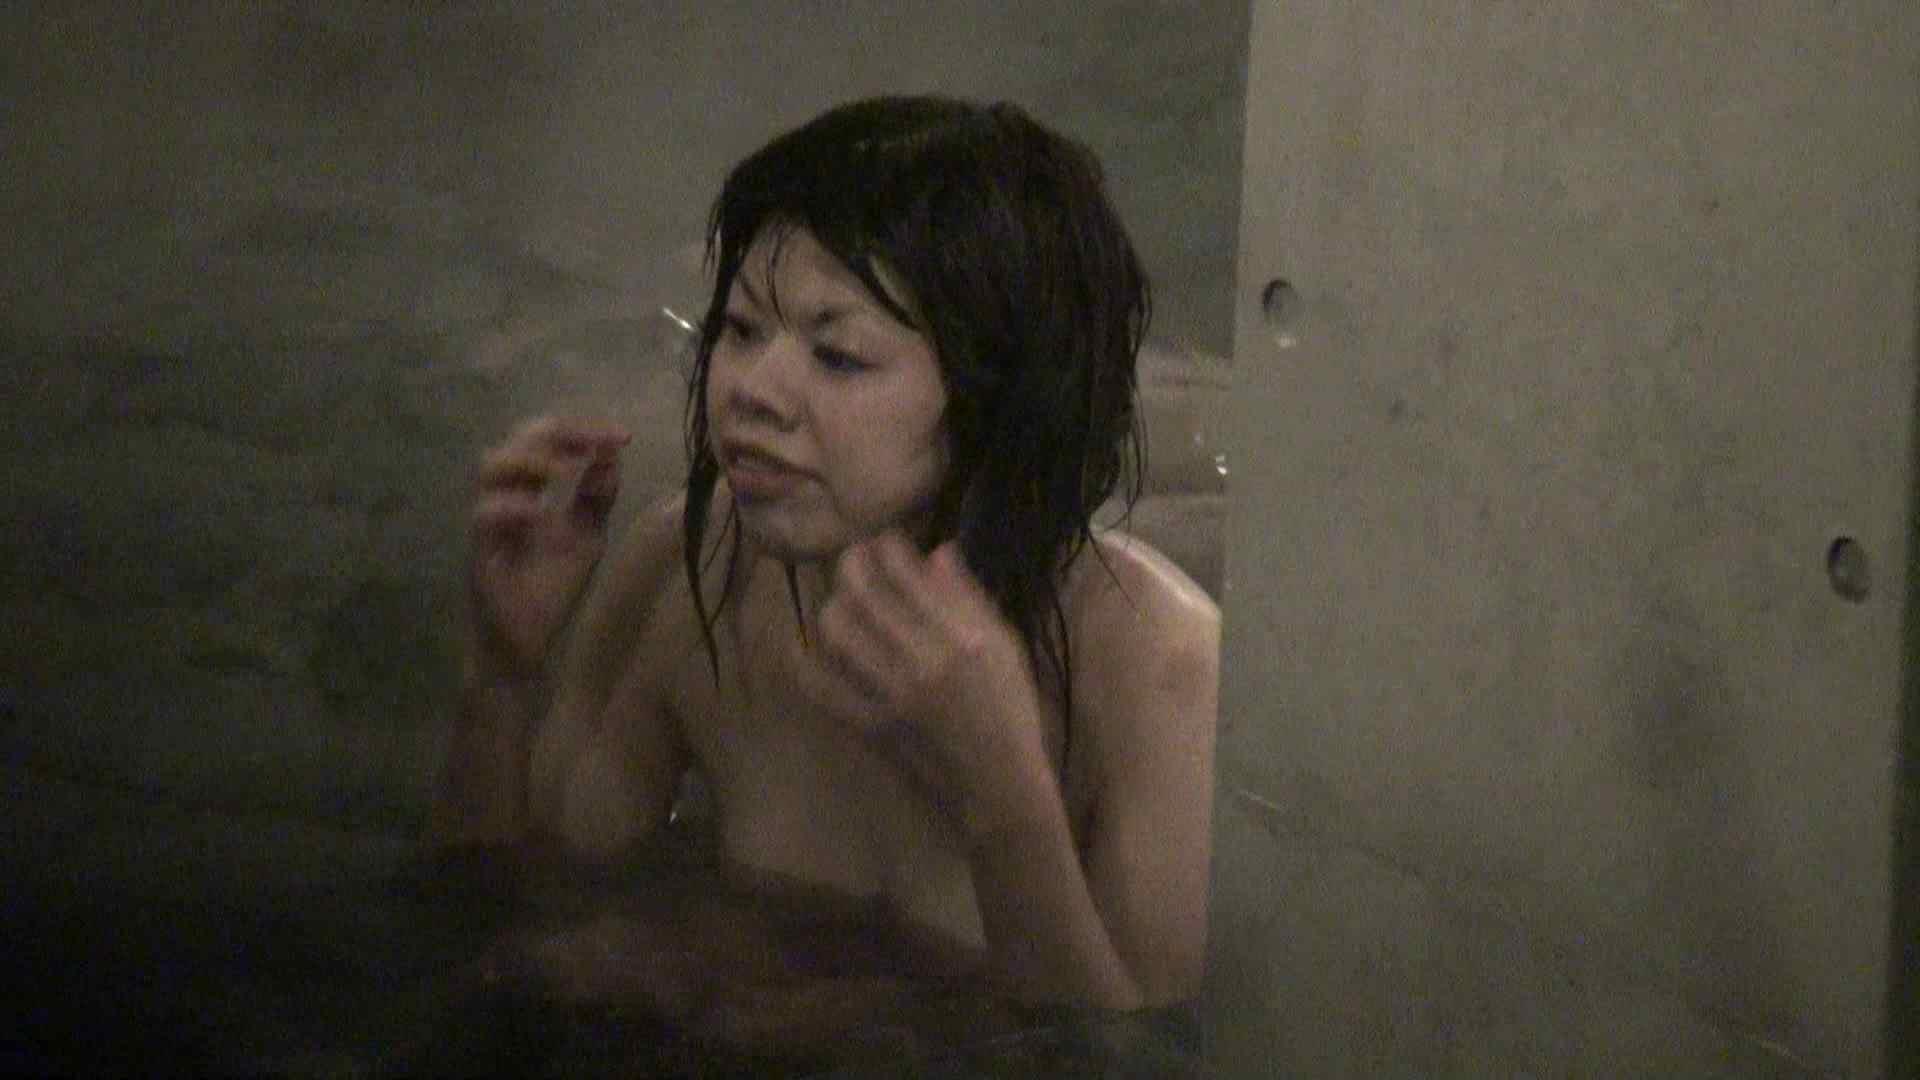 Aquaな露天風呂Vol.405 露天 | OL女体  86連発 58